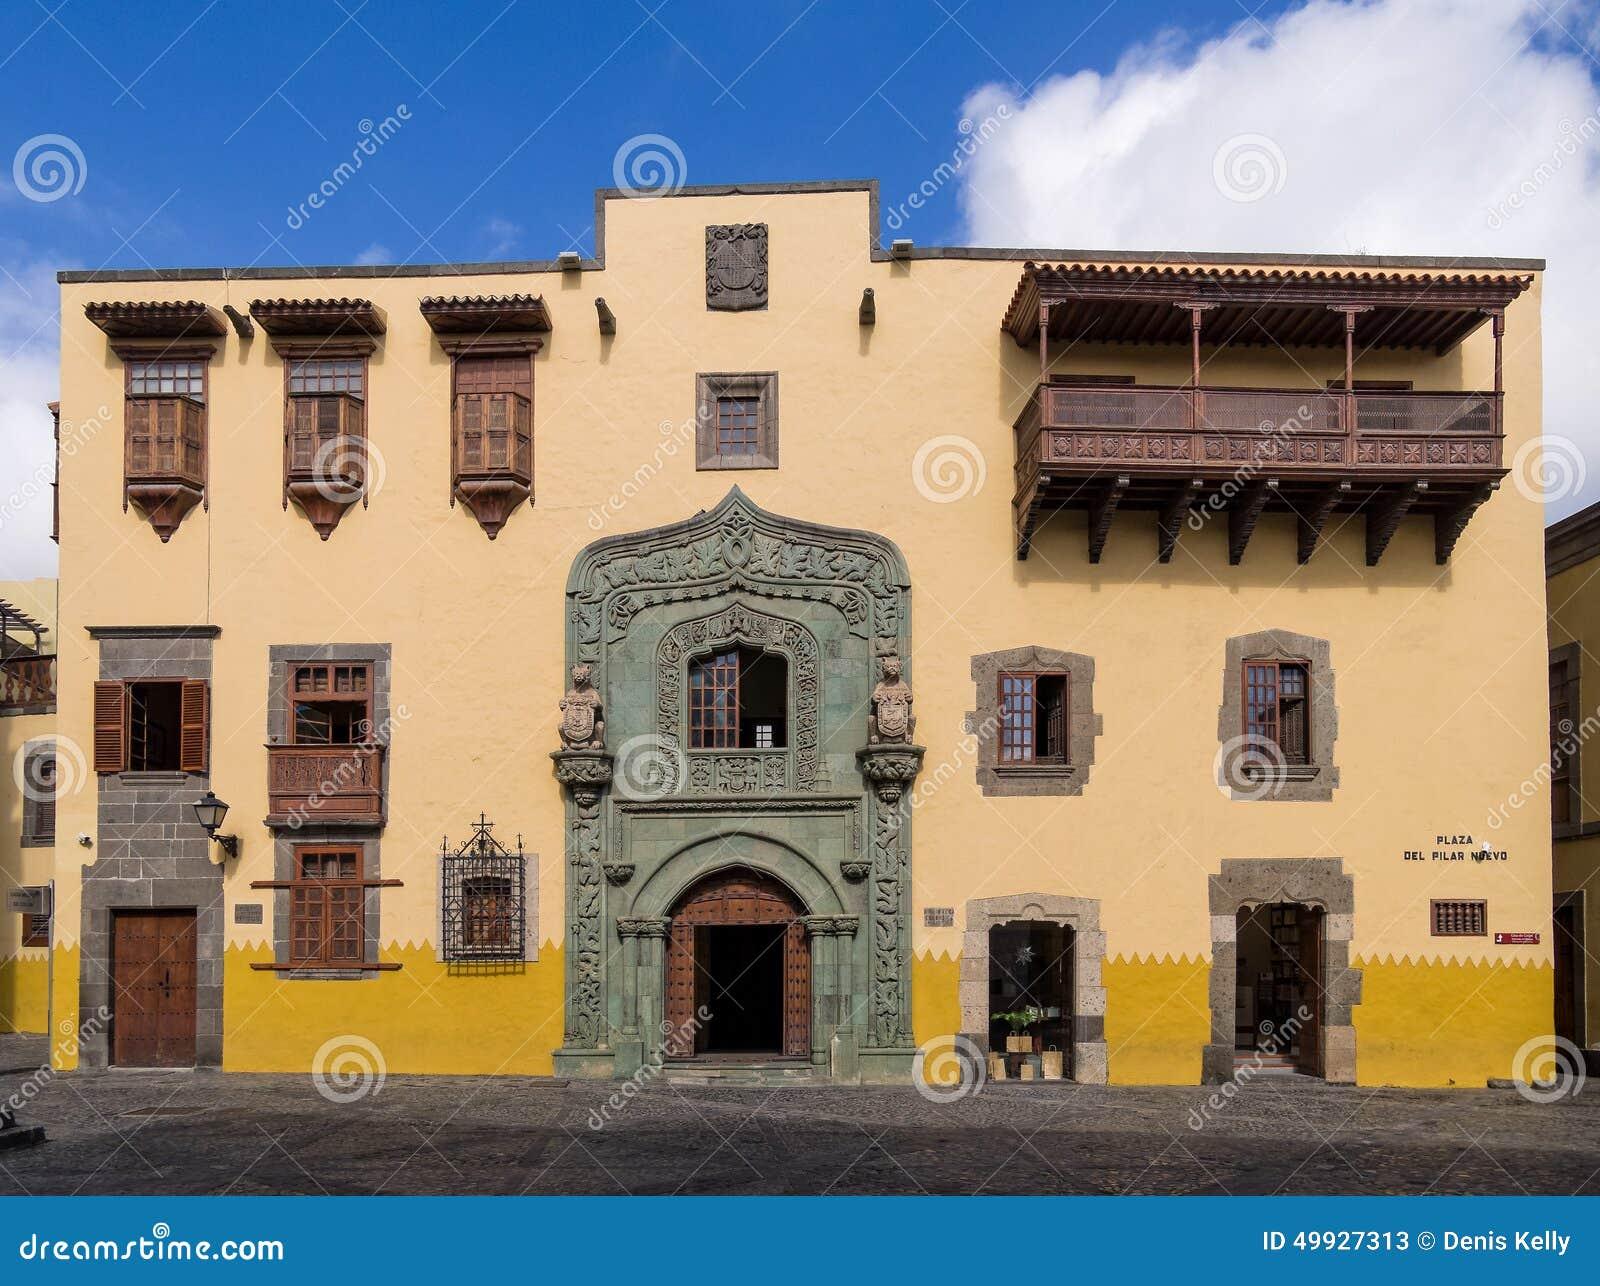 Christopher columbus house las palmas de gran canaria editorial stock photo image 49927313 - Apartamentos puerto rico las palmas ...